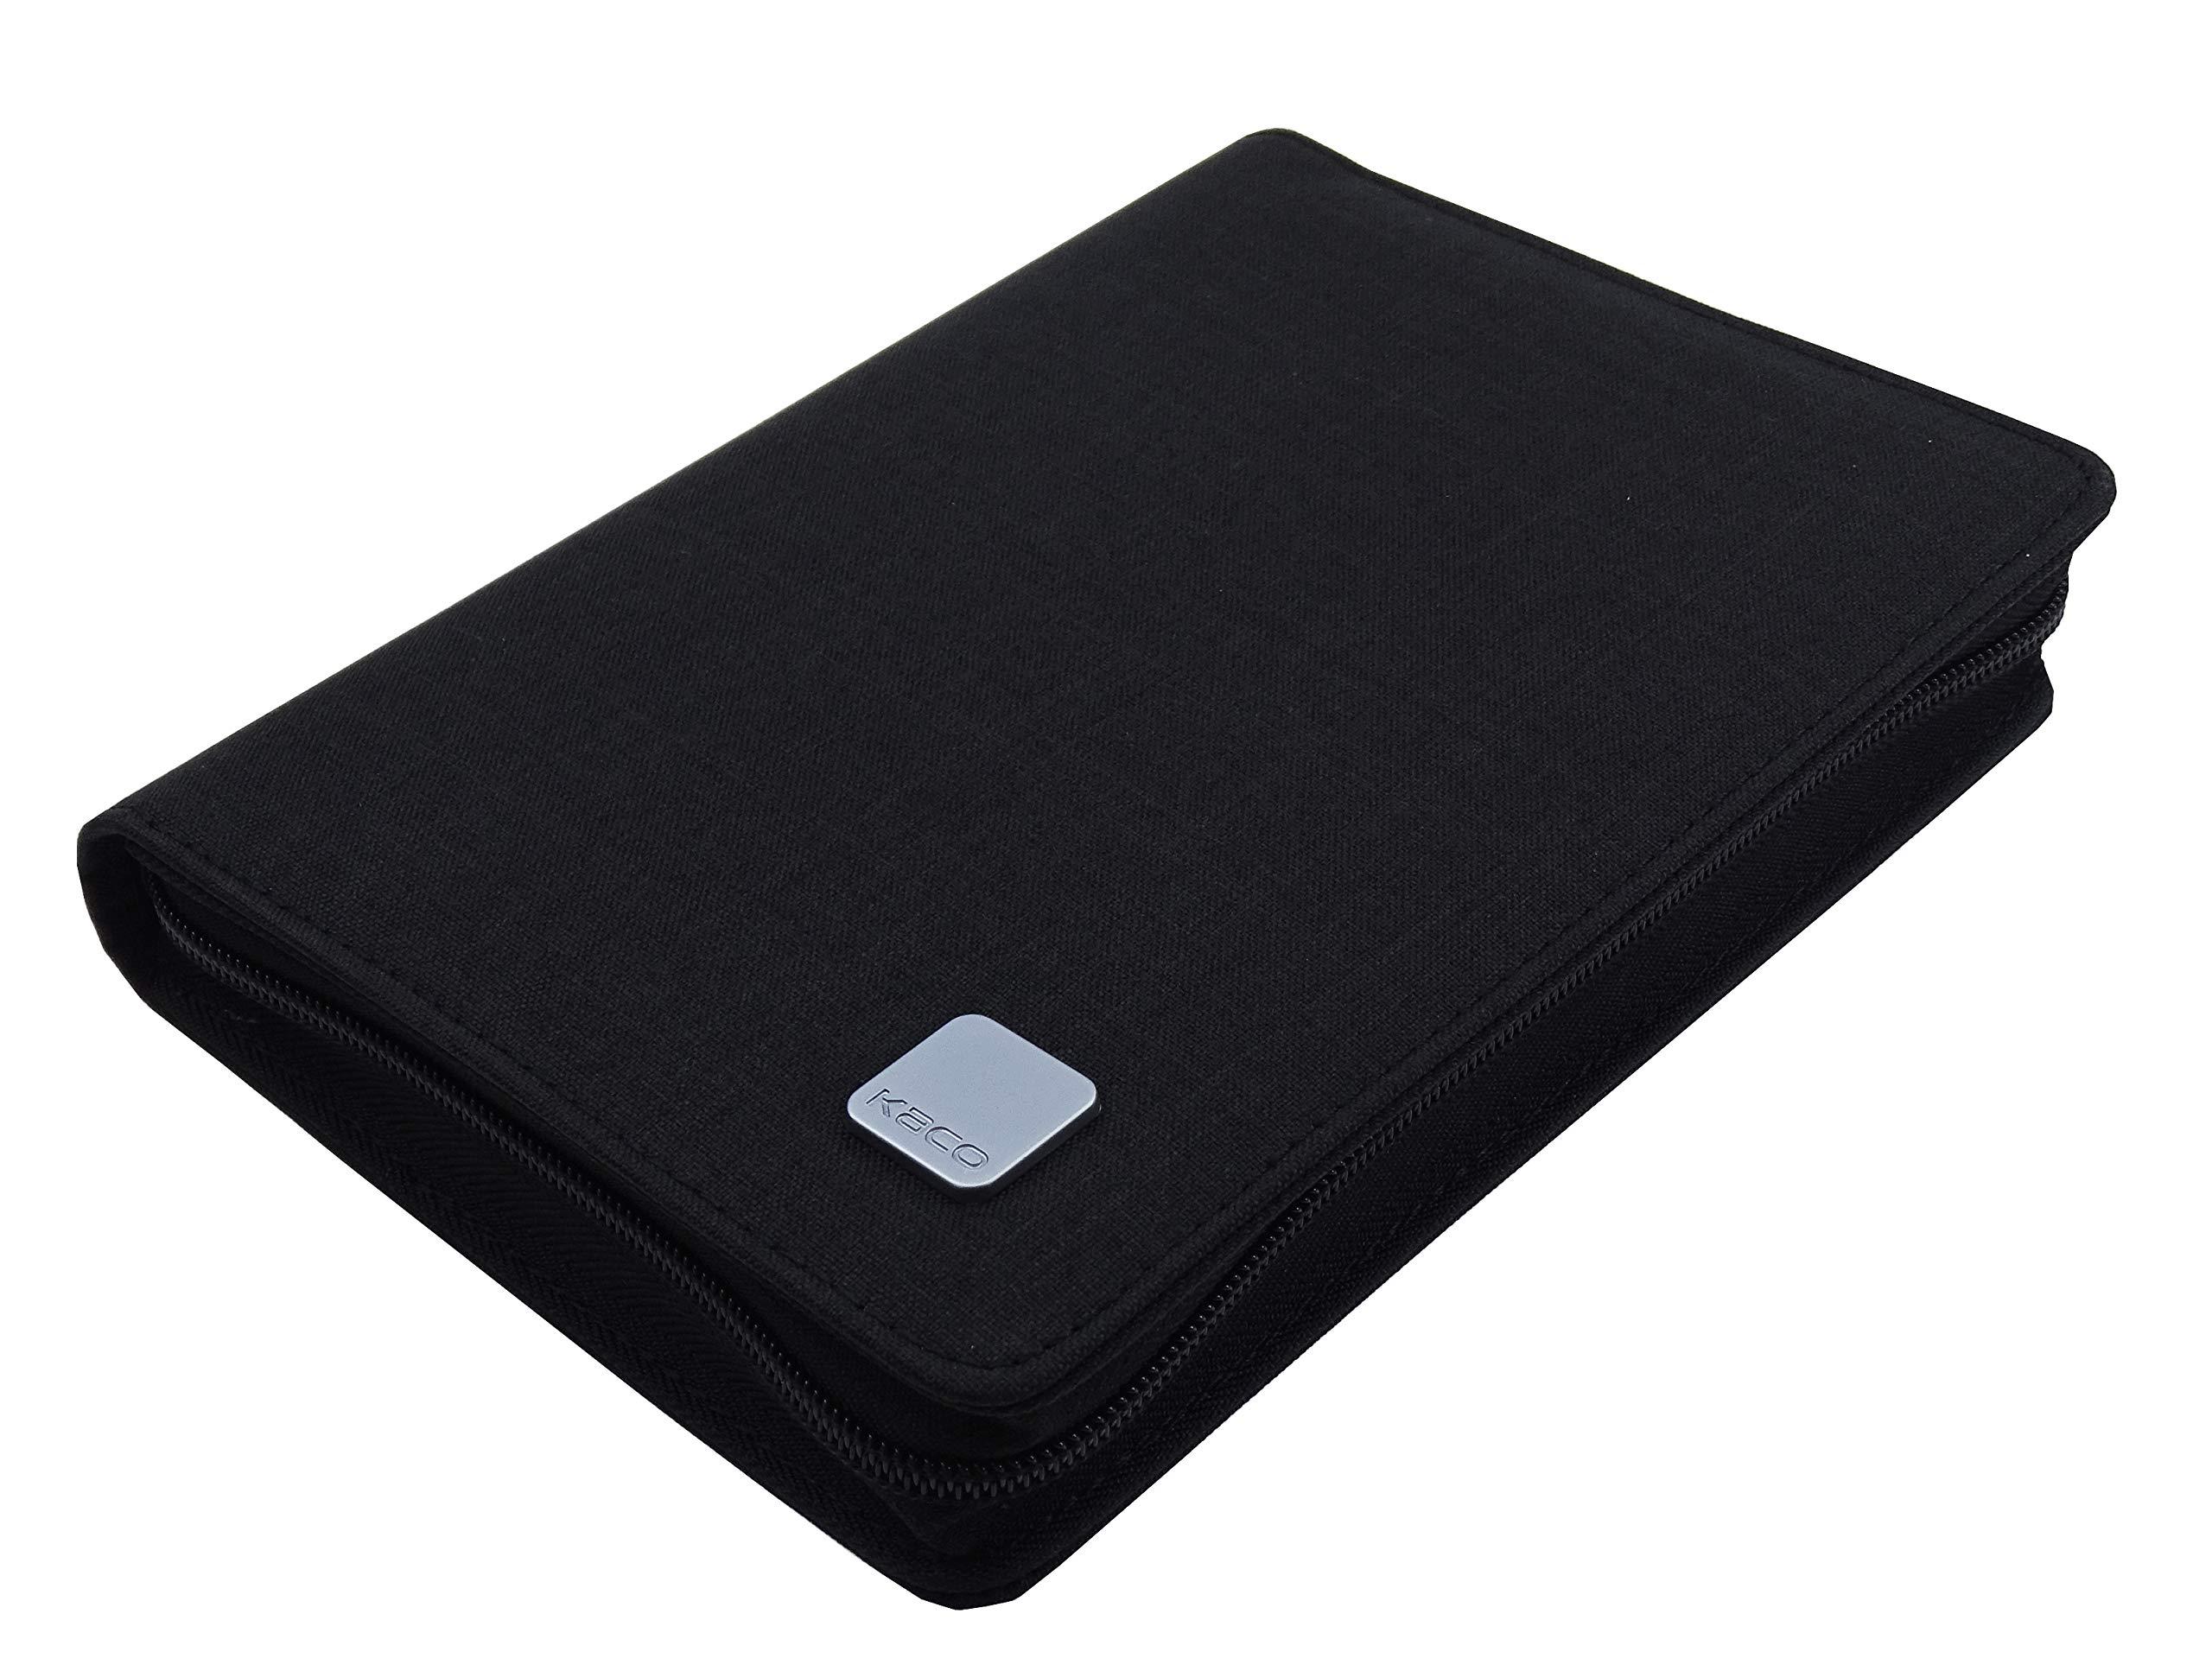 KACO Fountain Pen Pouch Pen, Rollerball Pen Case Bag, Business Style Black Waterproof for 10 Pen Pocket